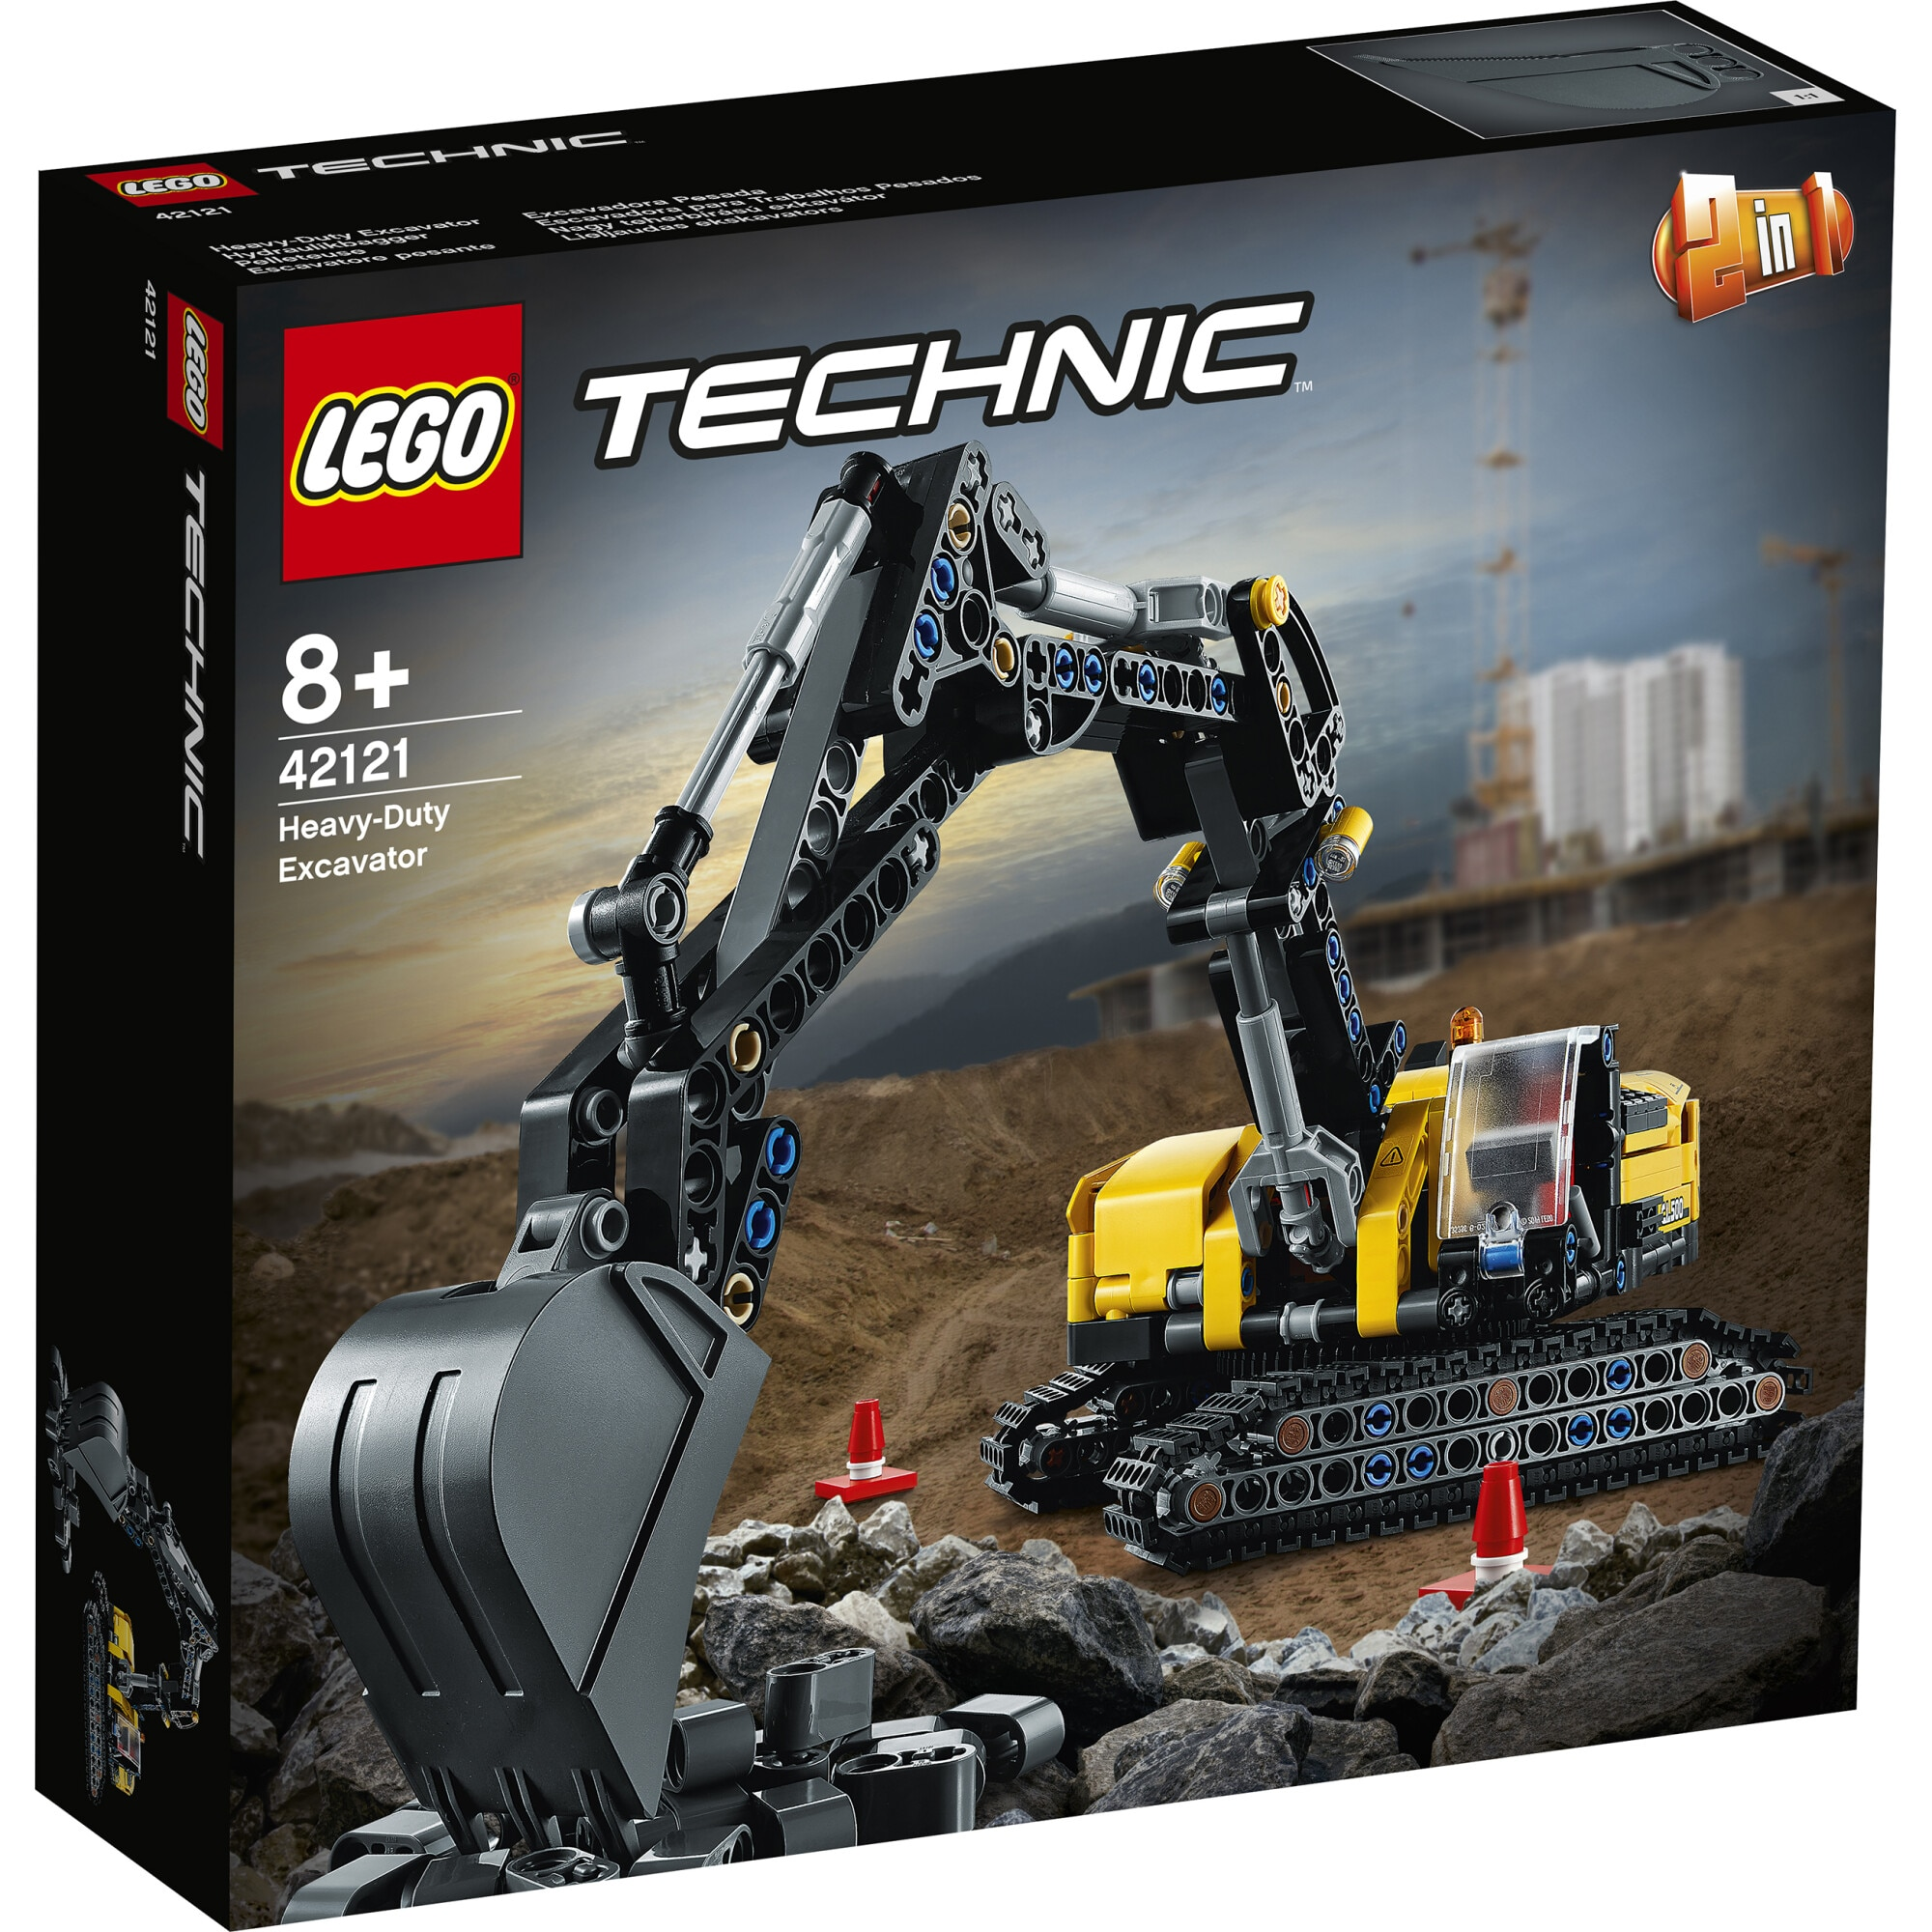 Fotografie LEGO Technic - Excavator de mare putere 42121, 569 piese